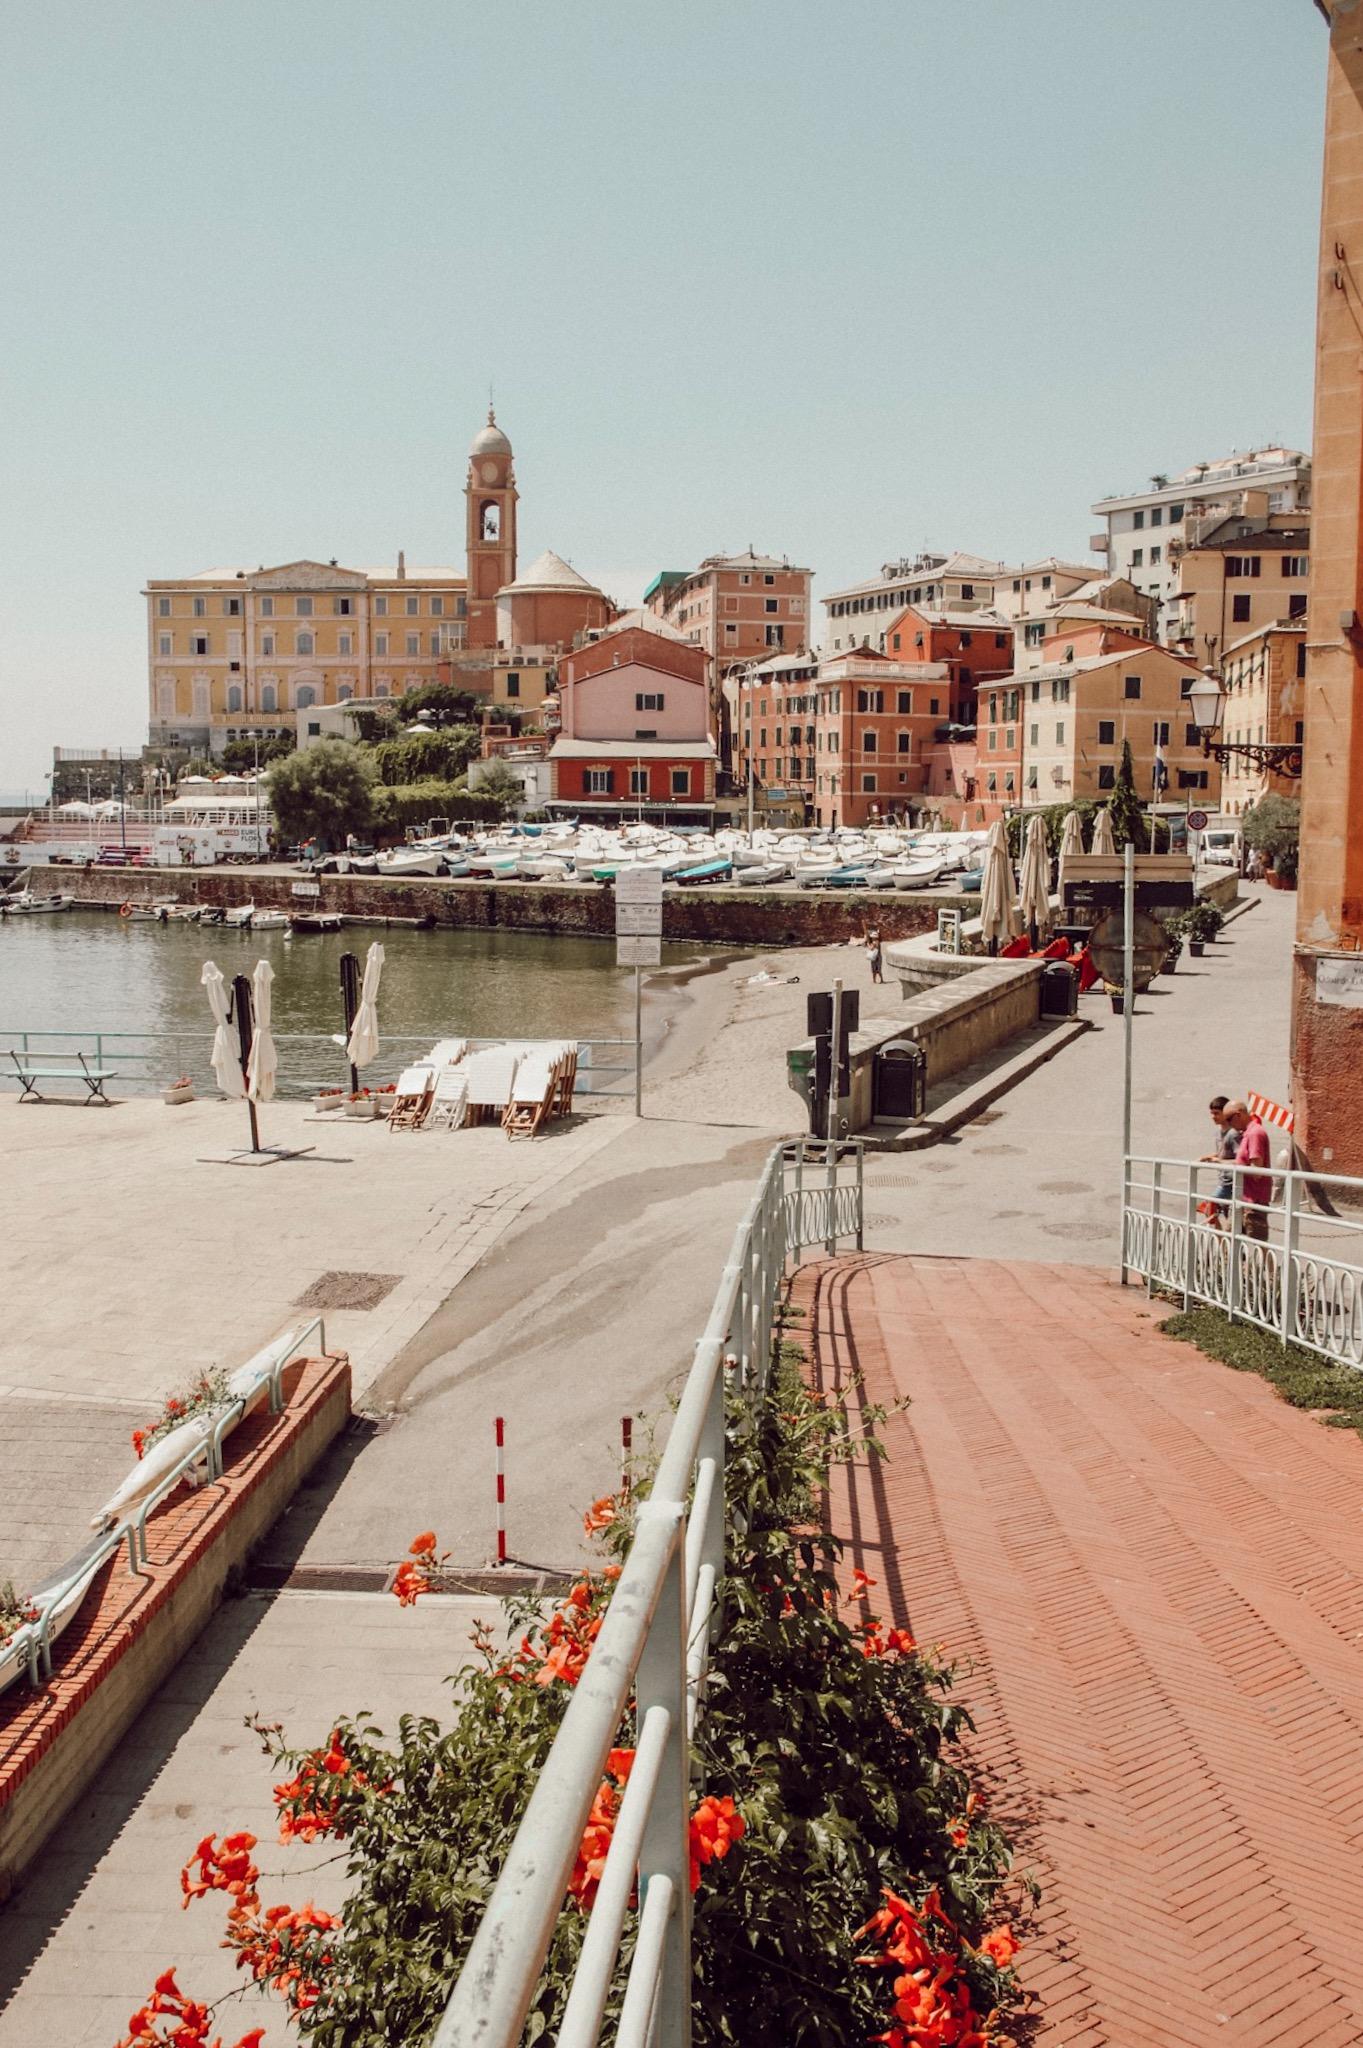 Nervi, Genua, Ligurien, Italien, italy, Travelblogger, daisies and glitter